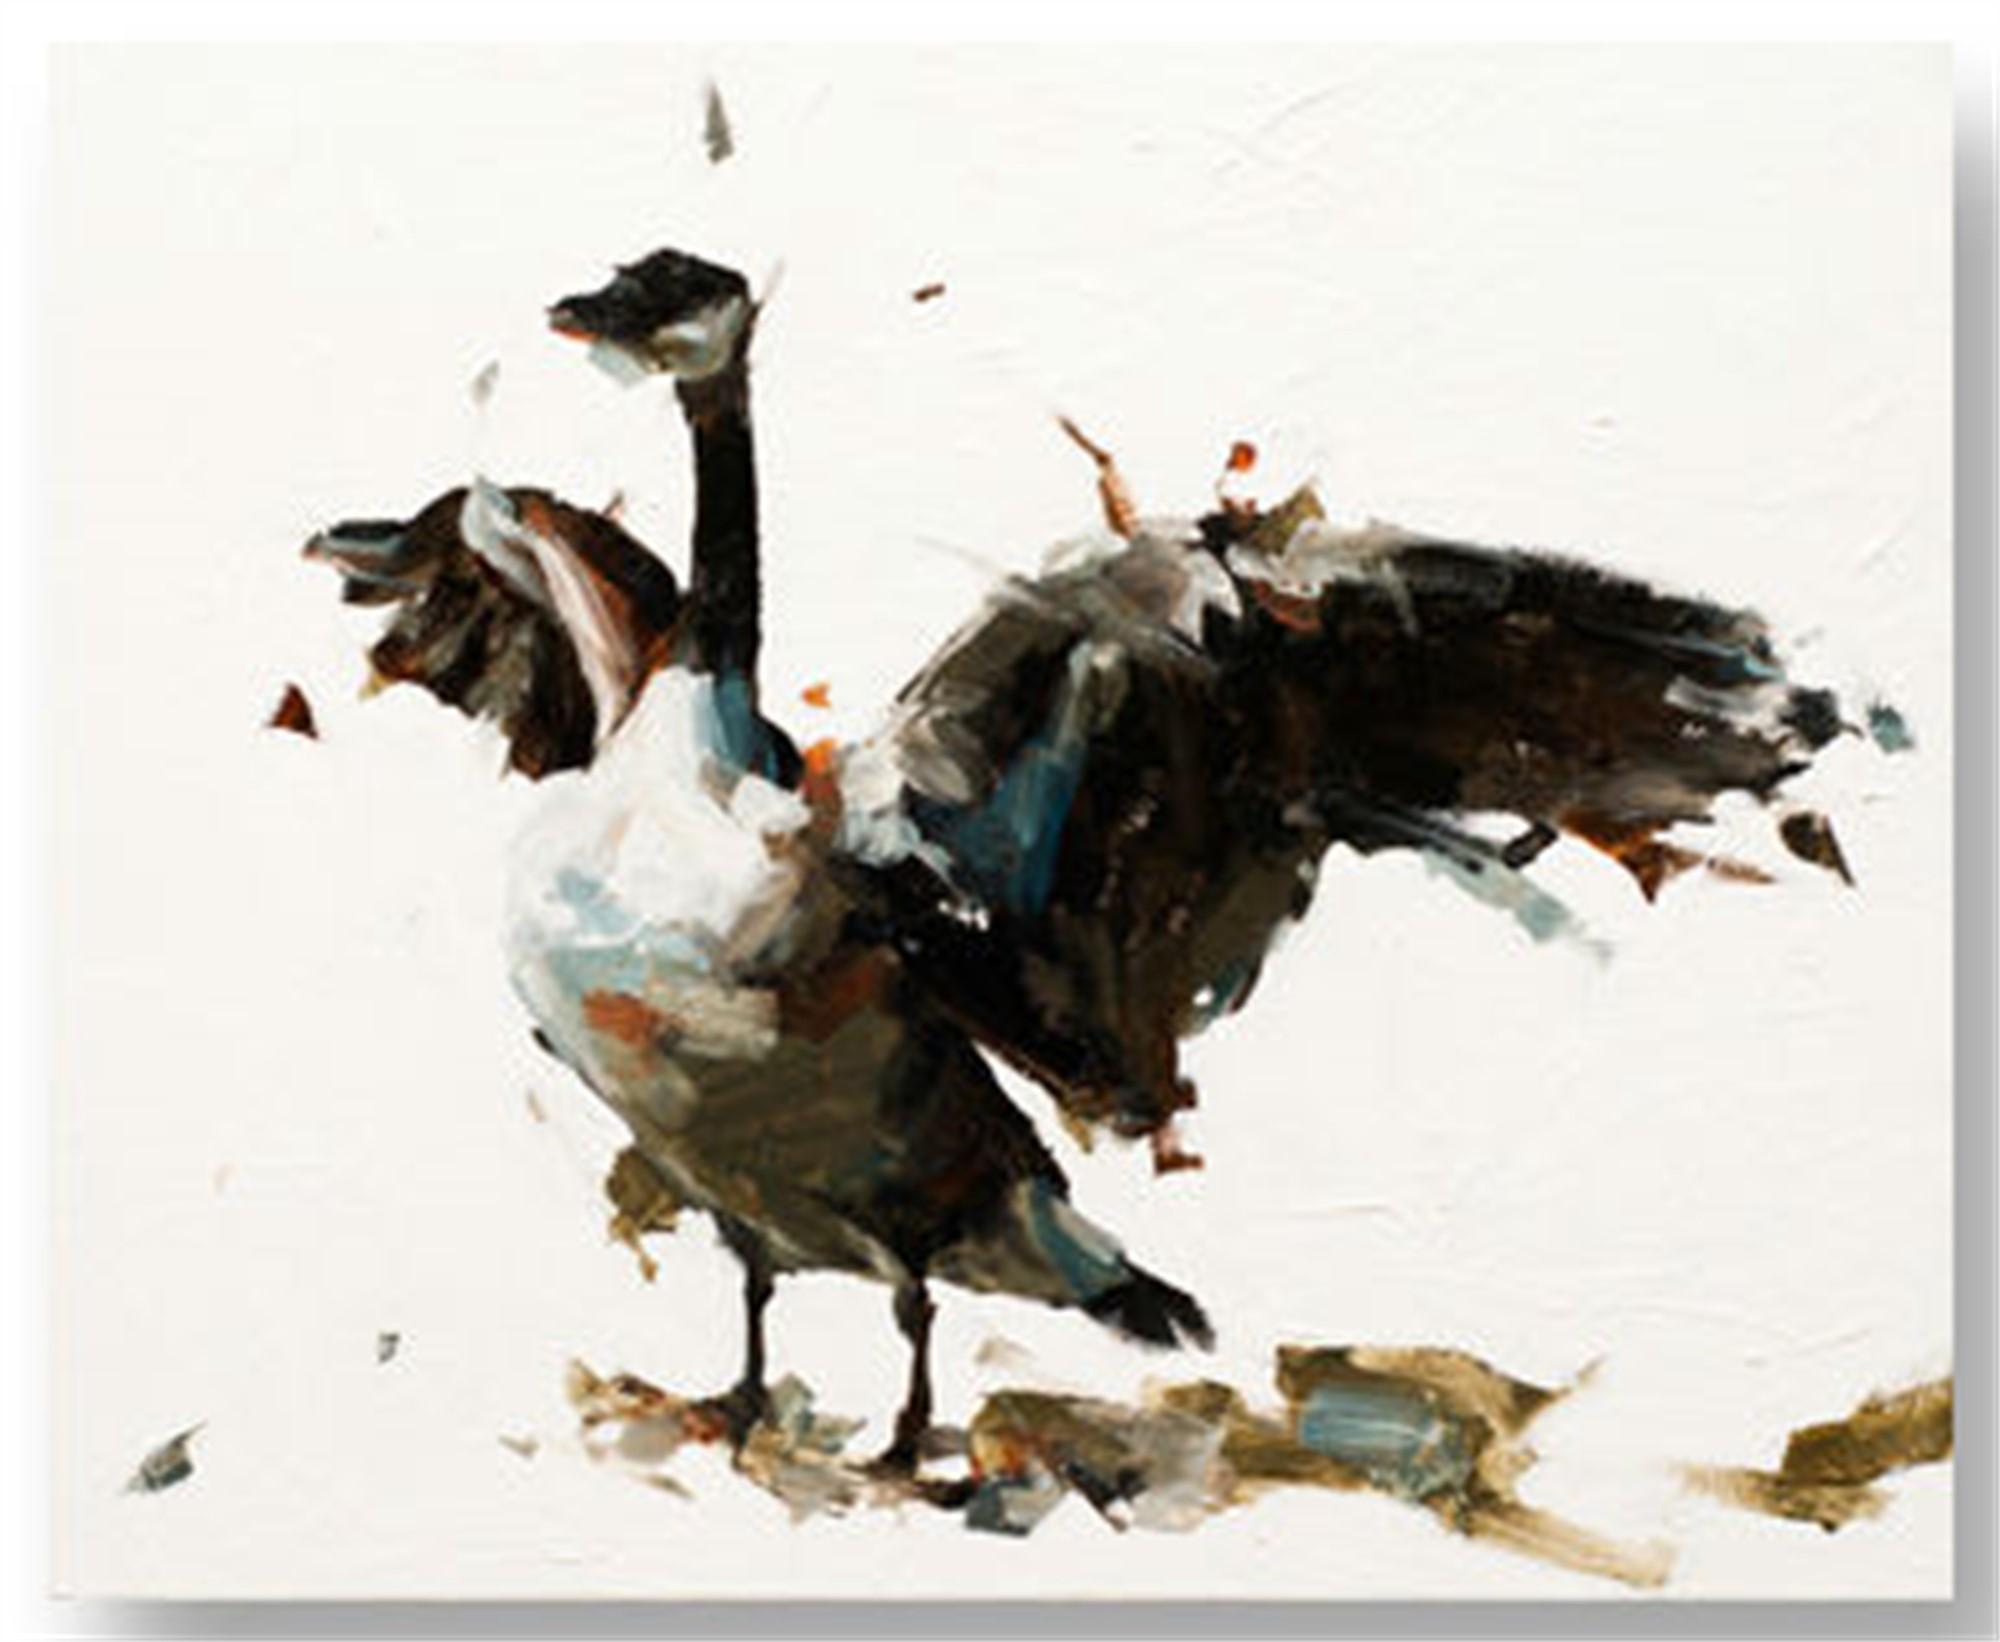 Goose by Thibault Jandot